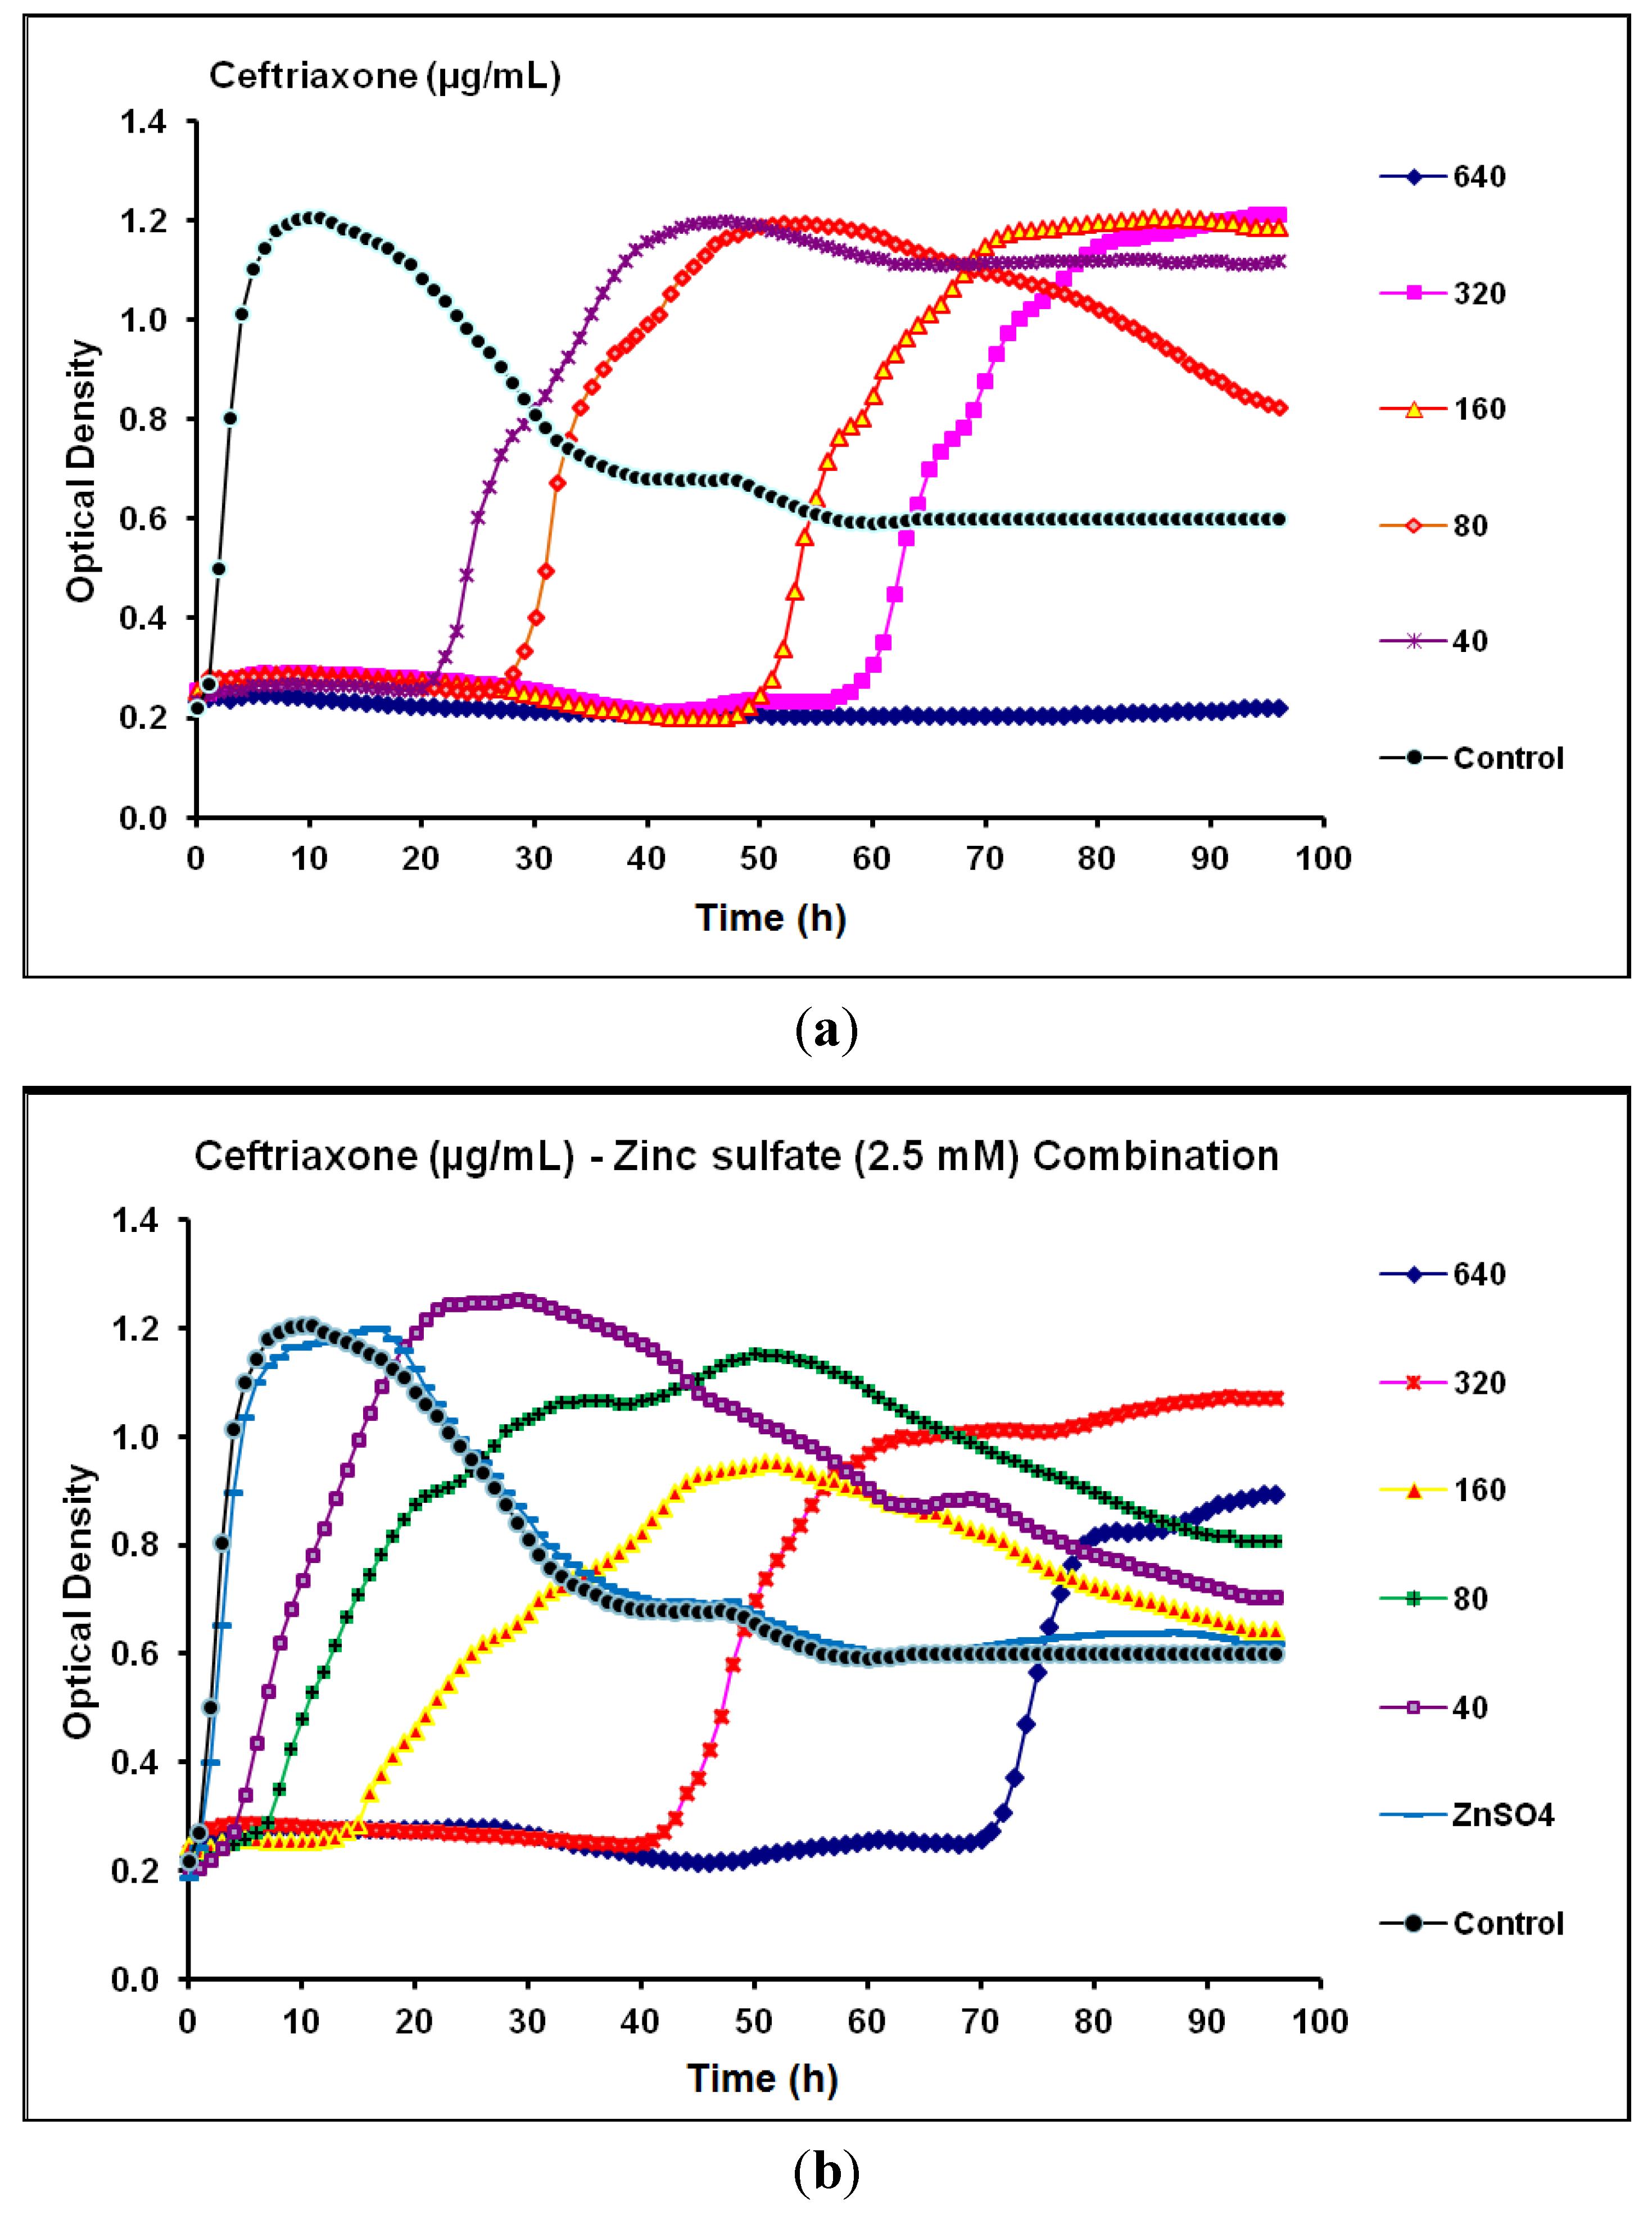 Effect of Pseudomonas aeruginosa rhamnolipid on human neutrophil and monocyte function